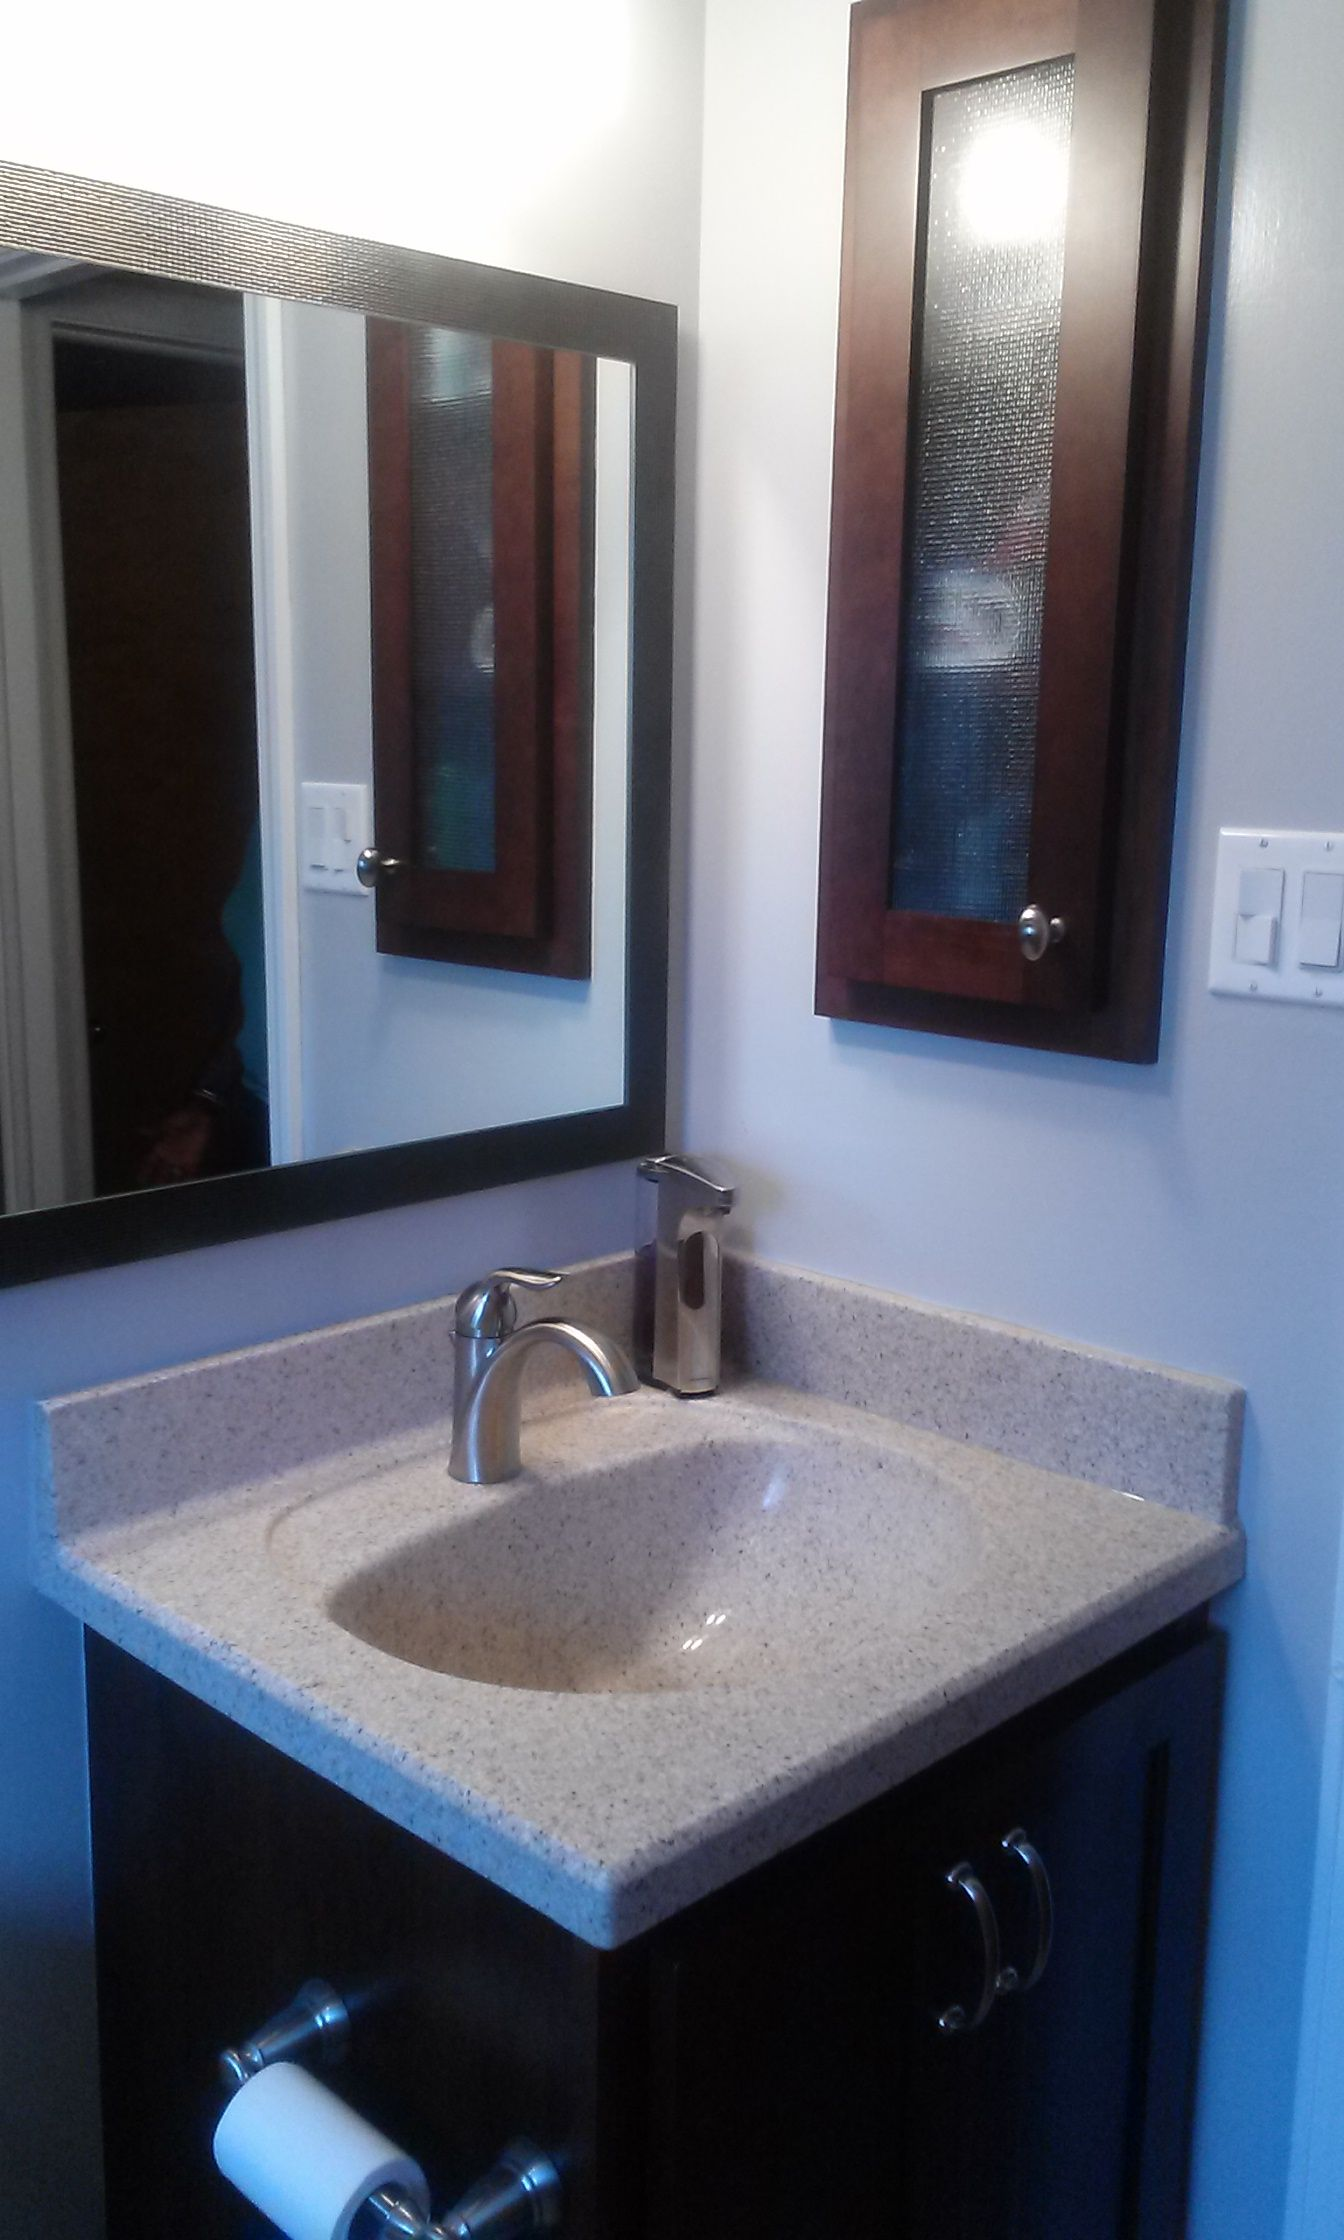 Swanstone Shower Wall Kit With Bench Seat At Menards   Bathroom. Menards Shower Kits   Urevoo com